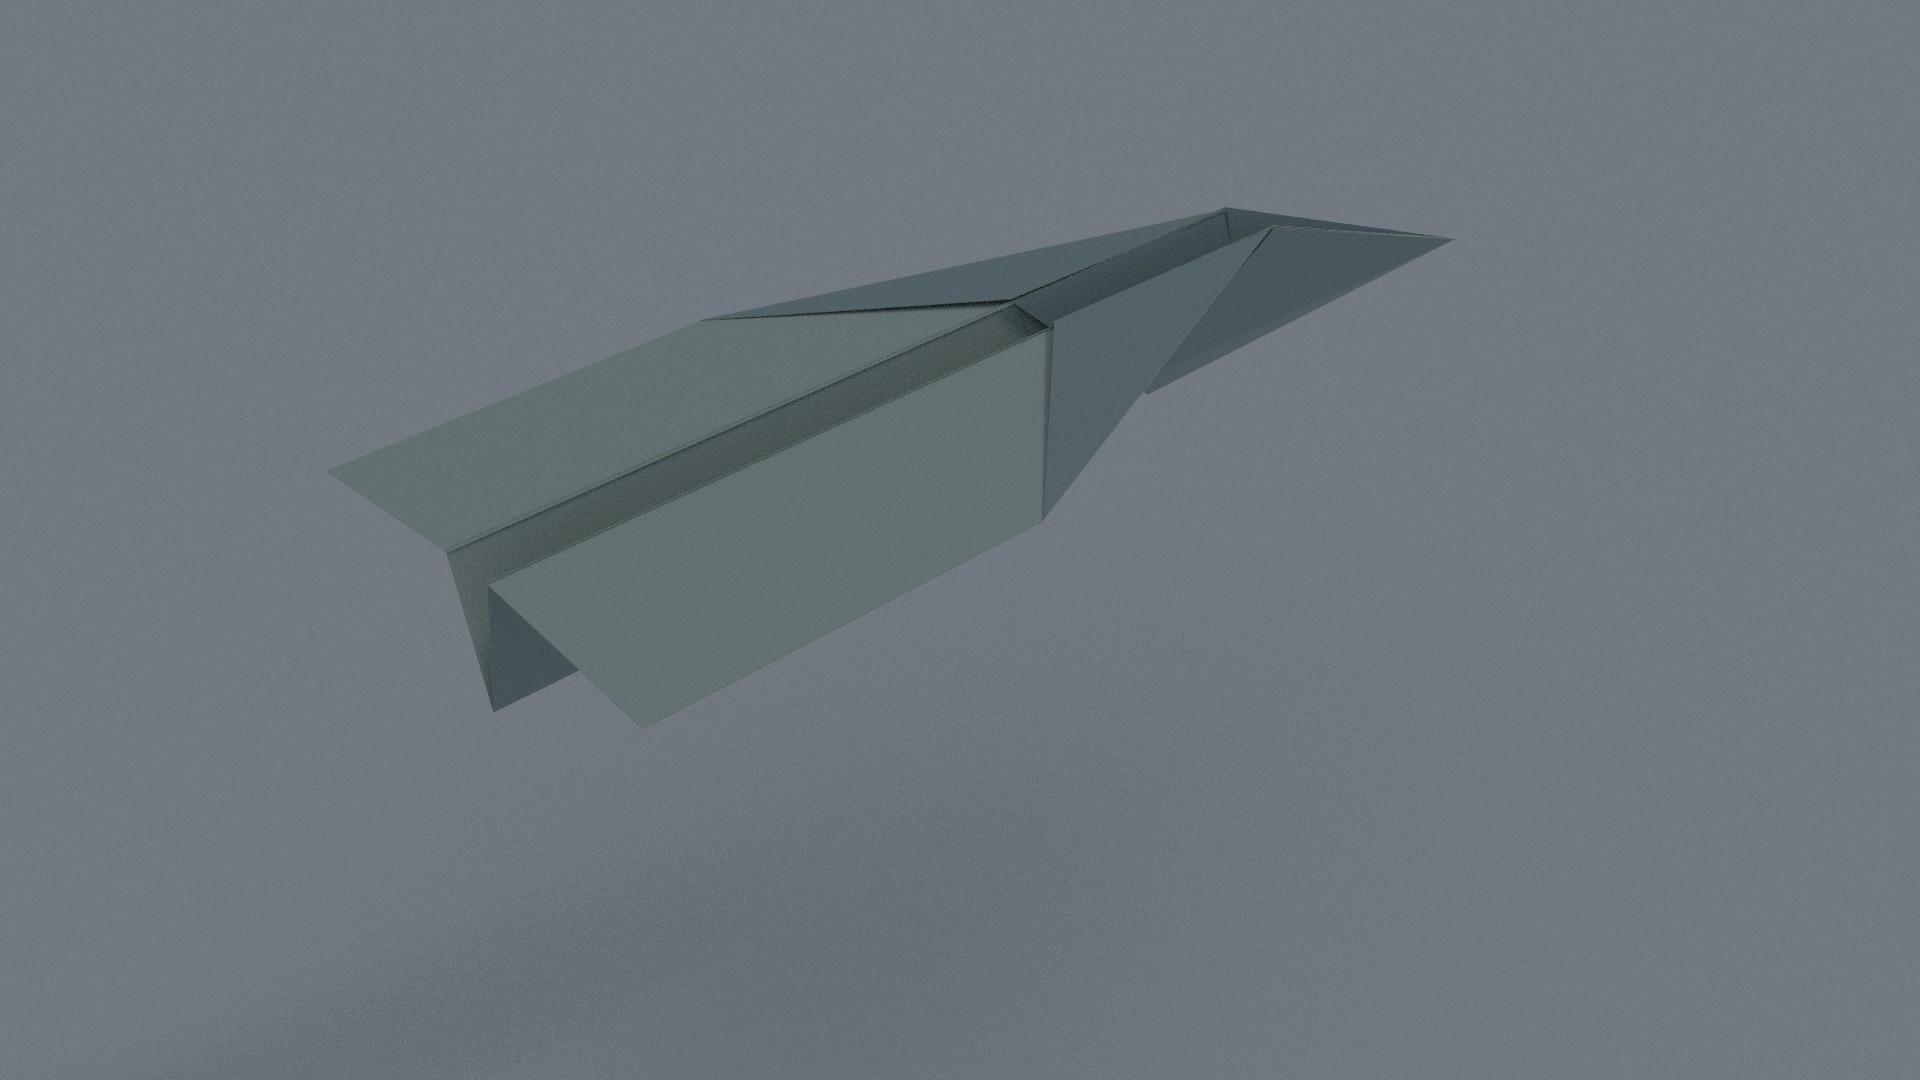 #285 - Animated Paper Plane Folding.